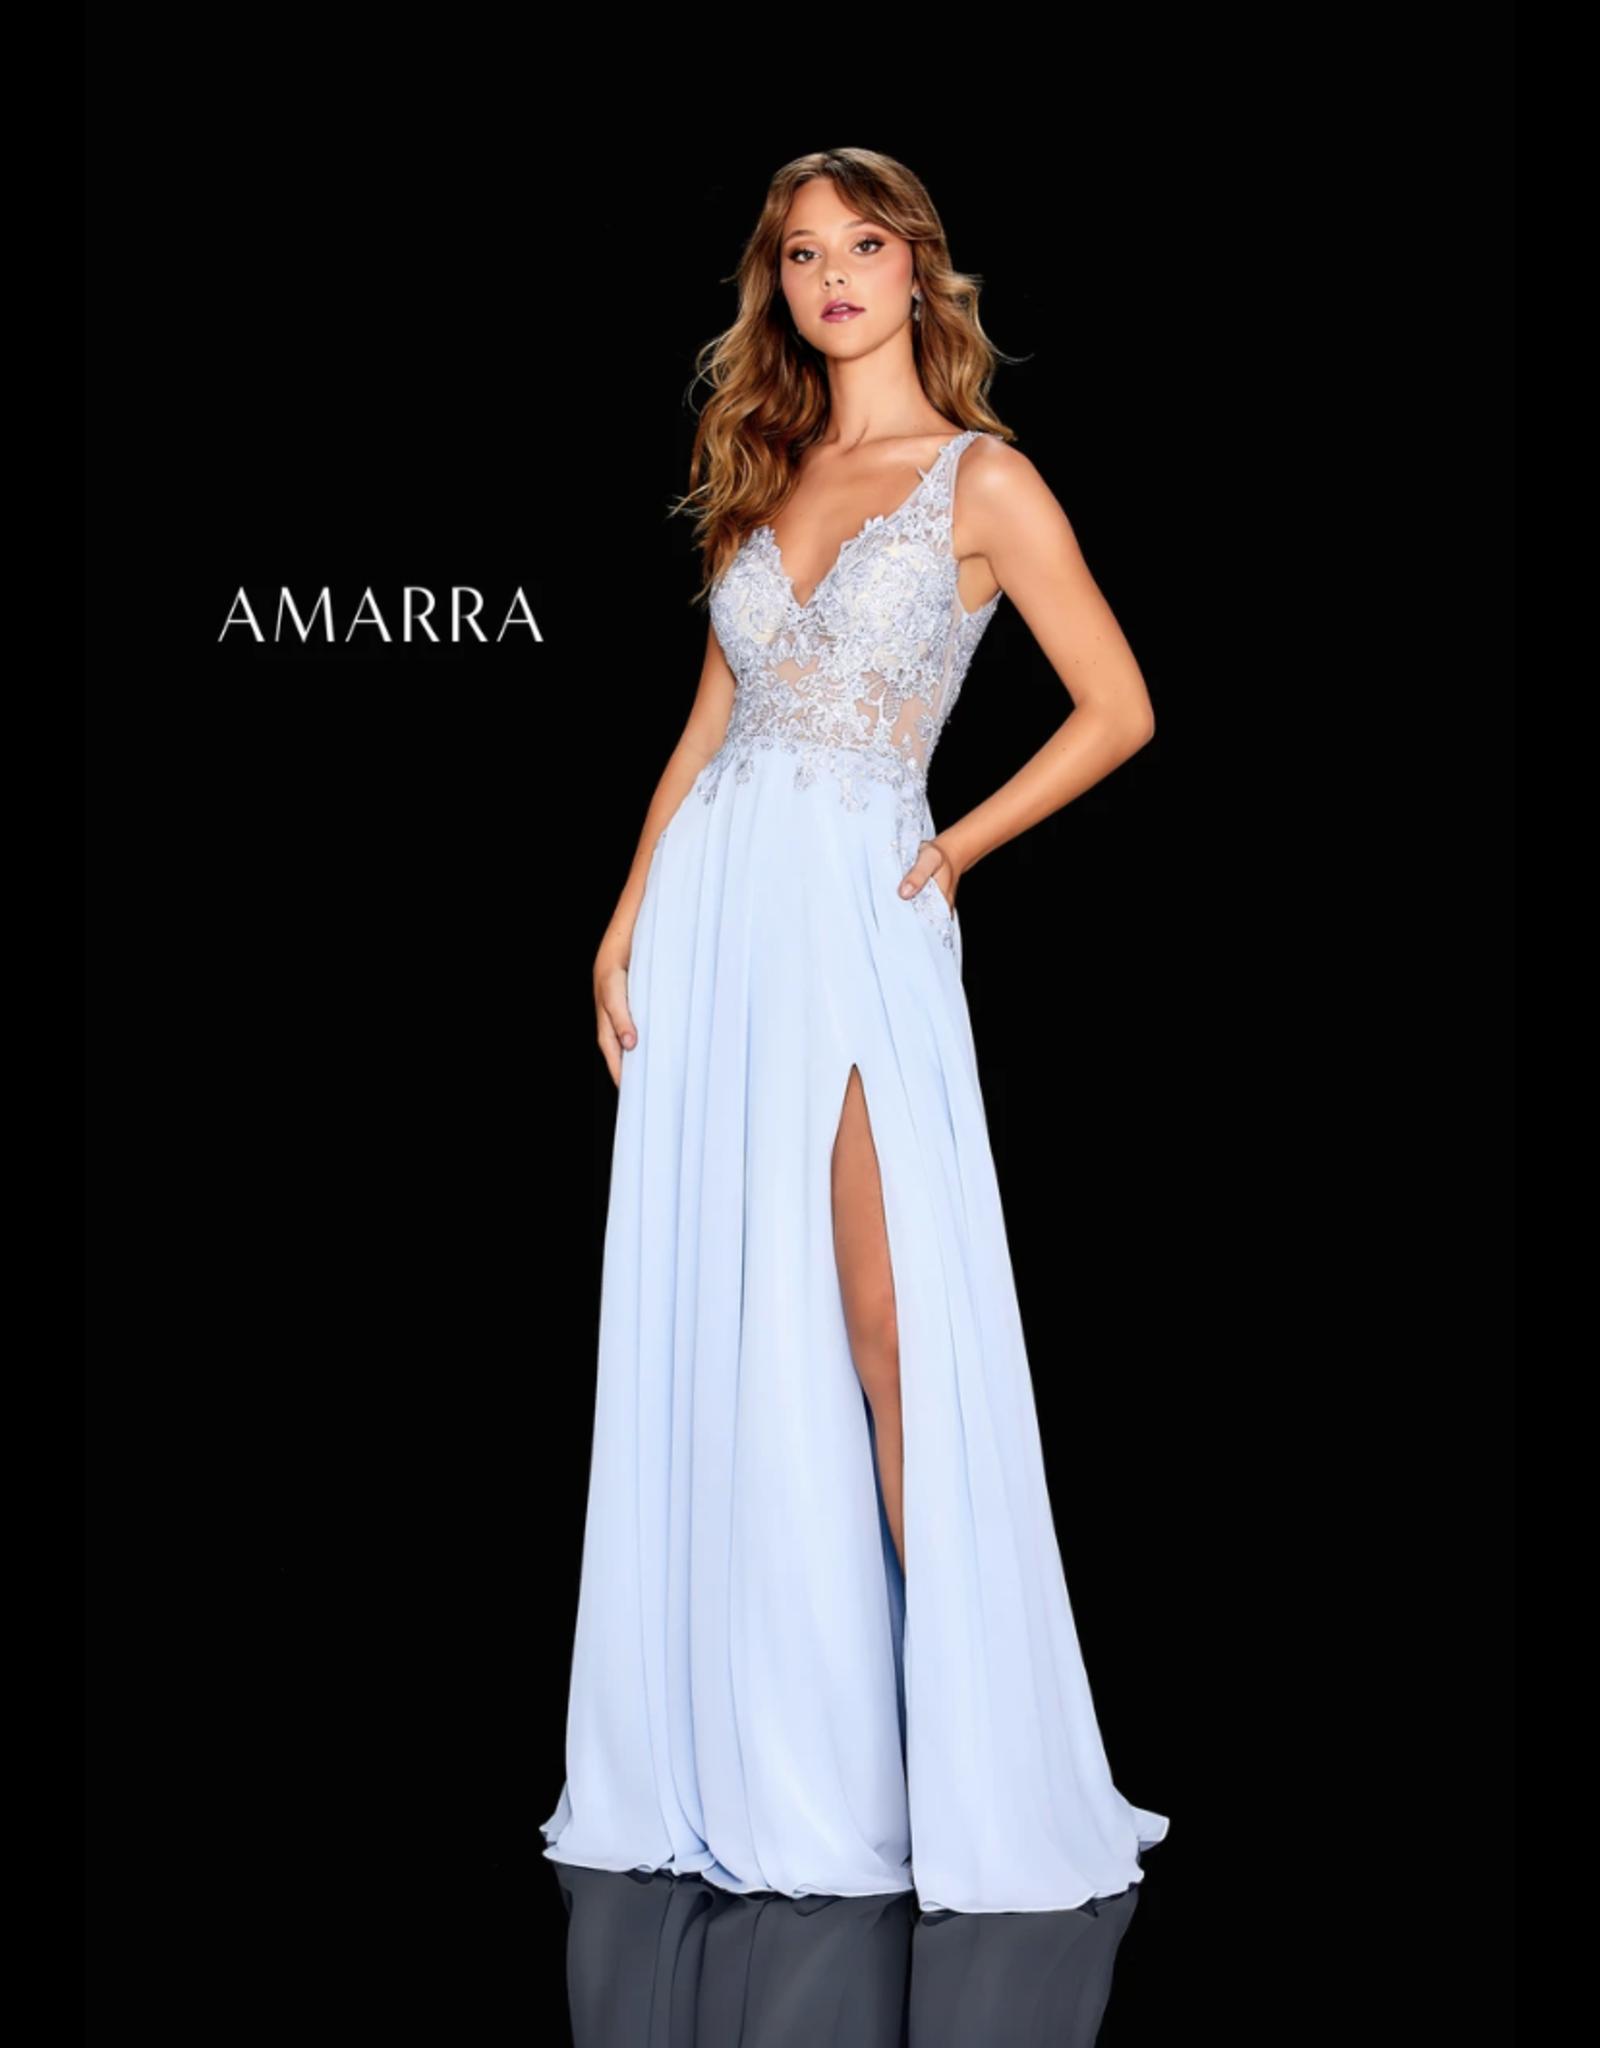 Amarra 20212 Amarra Dresses